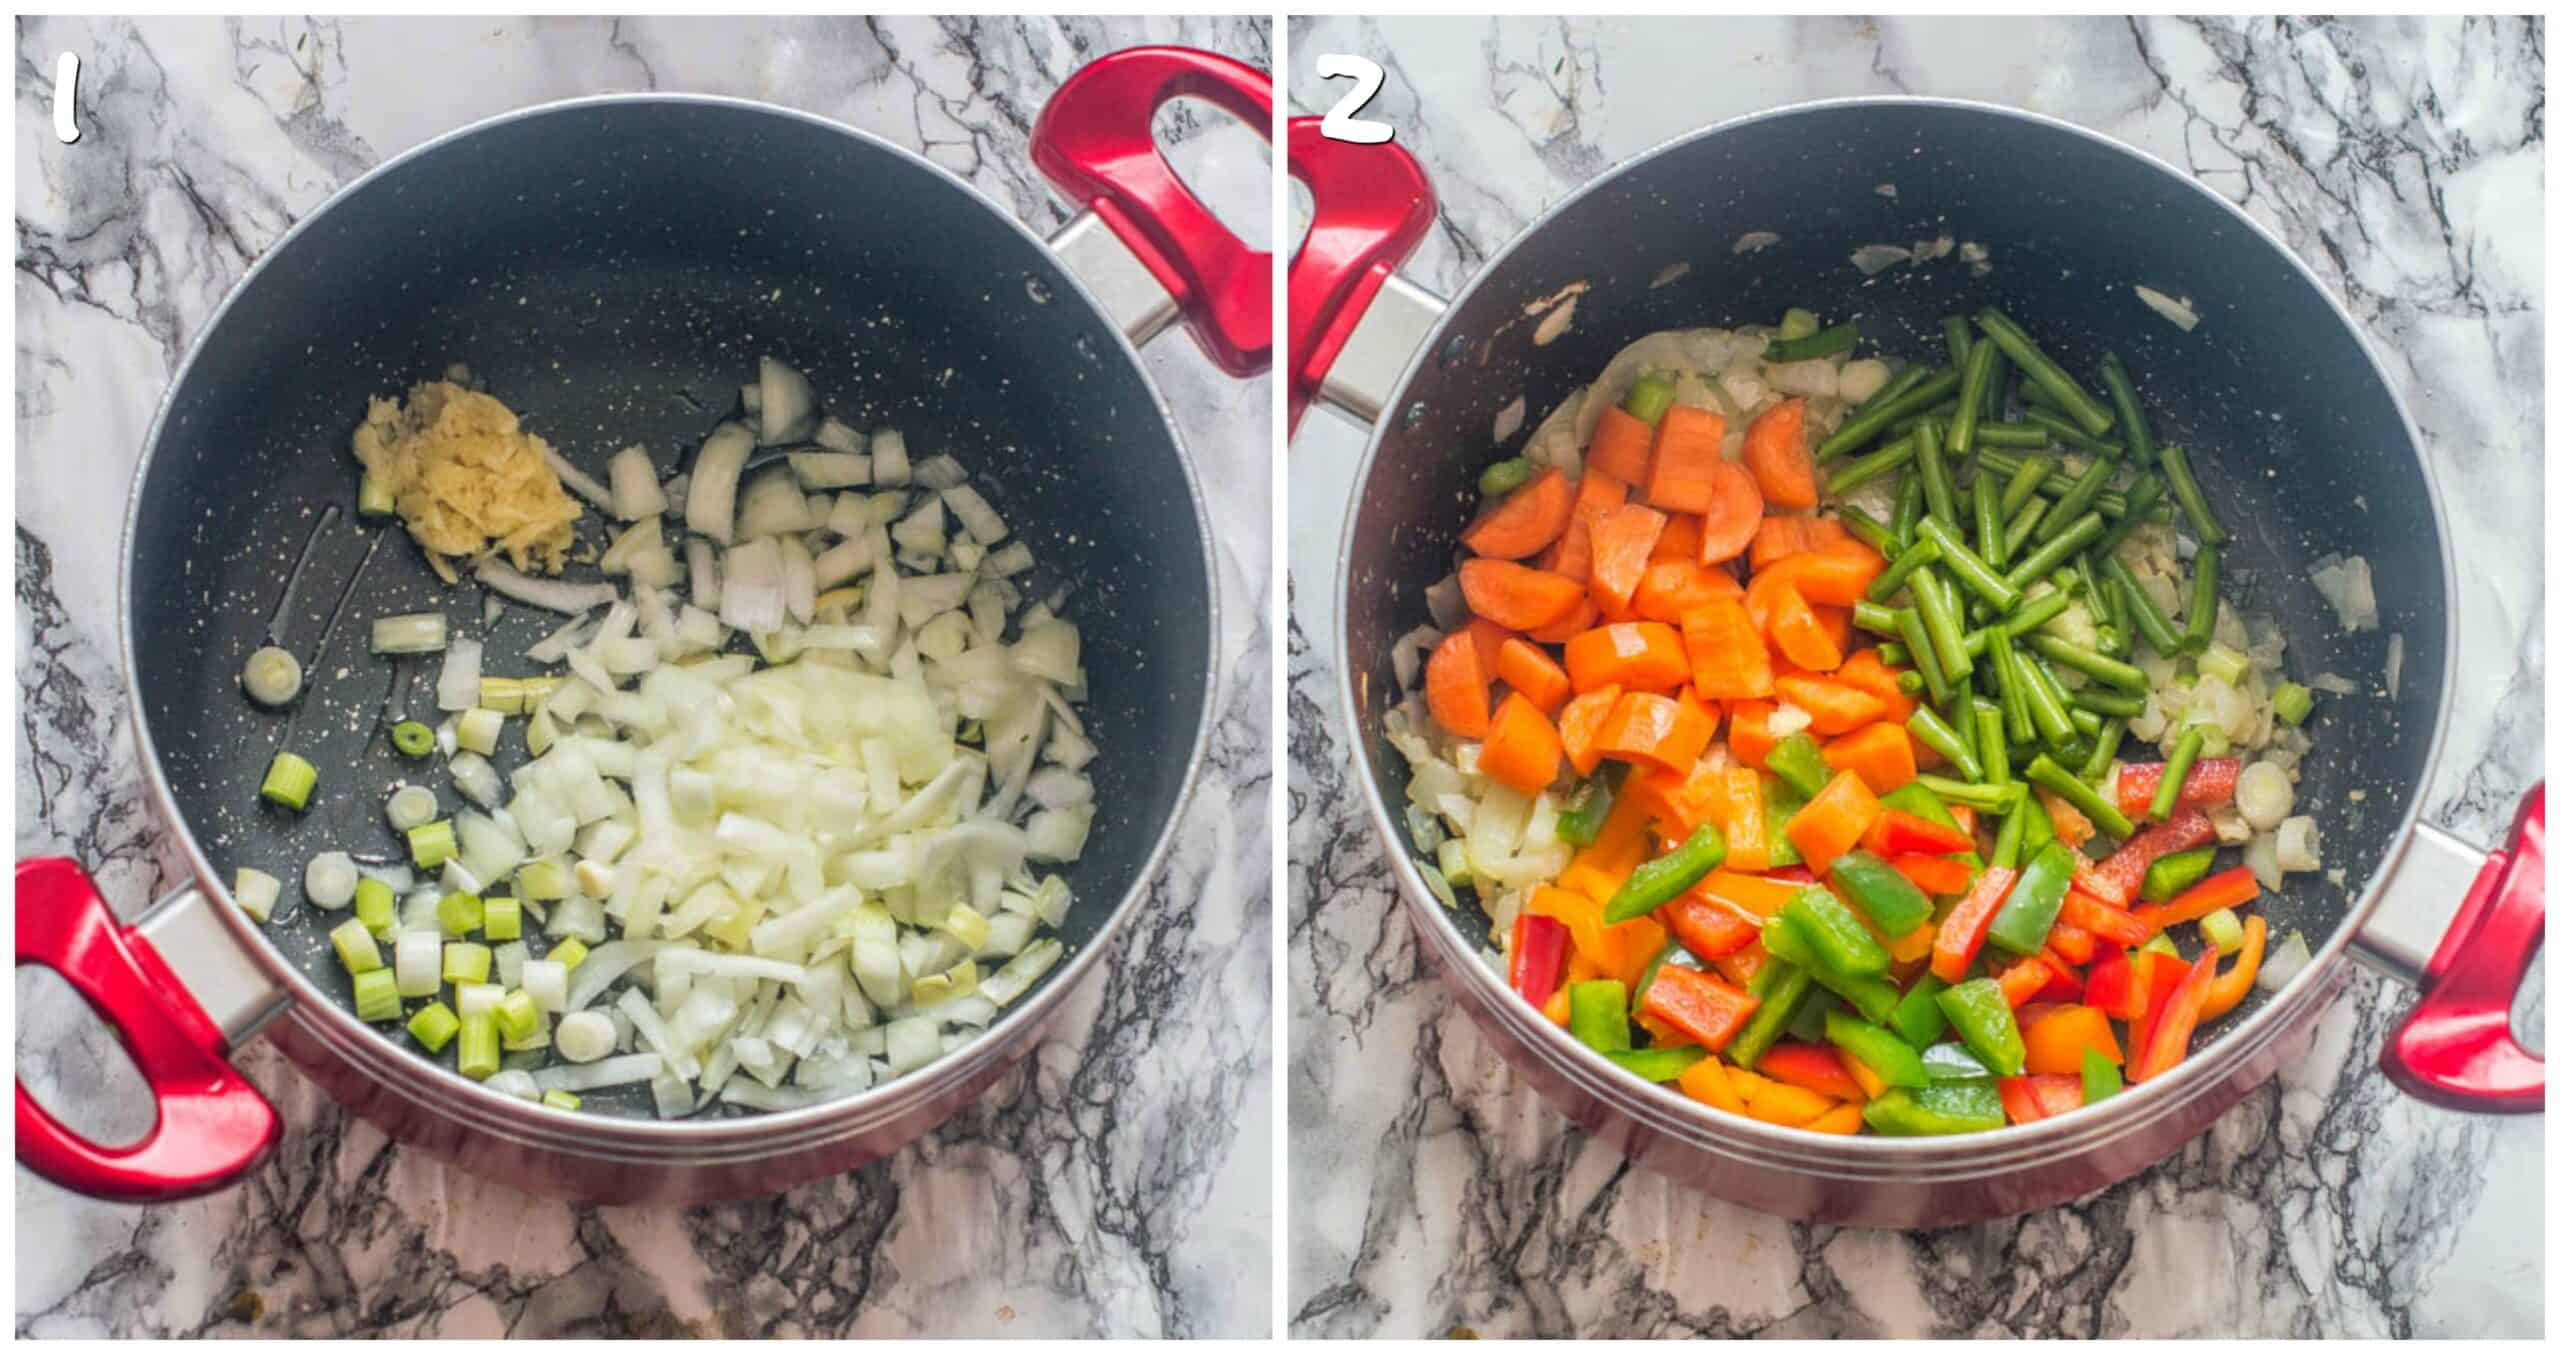 Steps 1-2 saute onion, garlic, scallion and vegetables